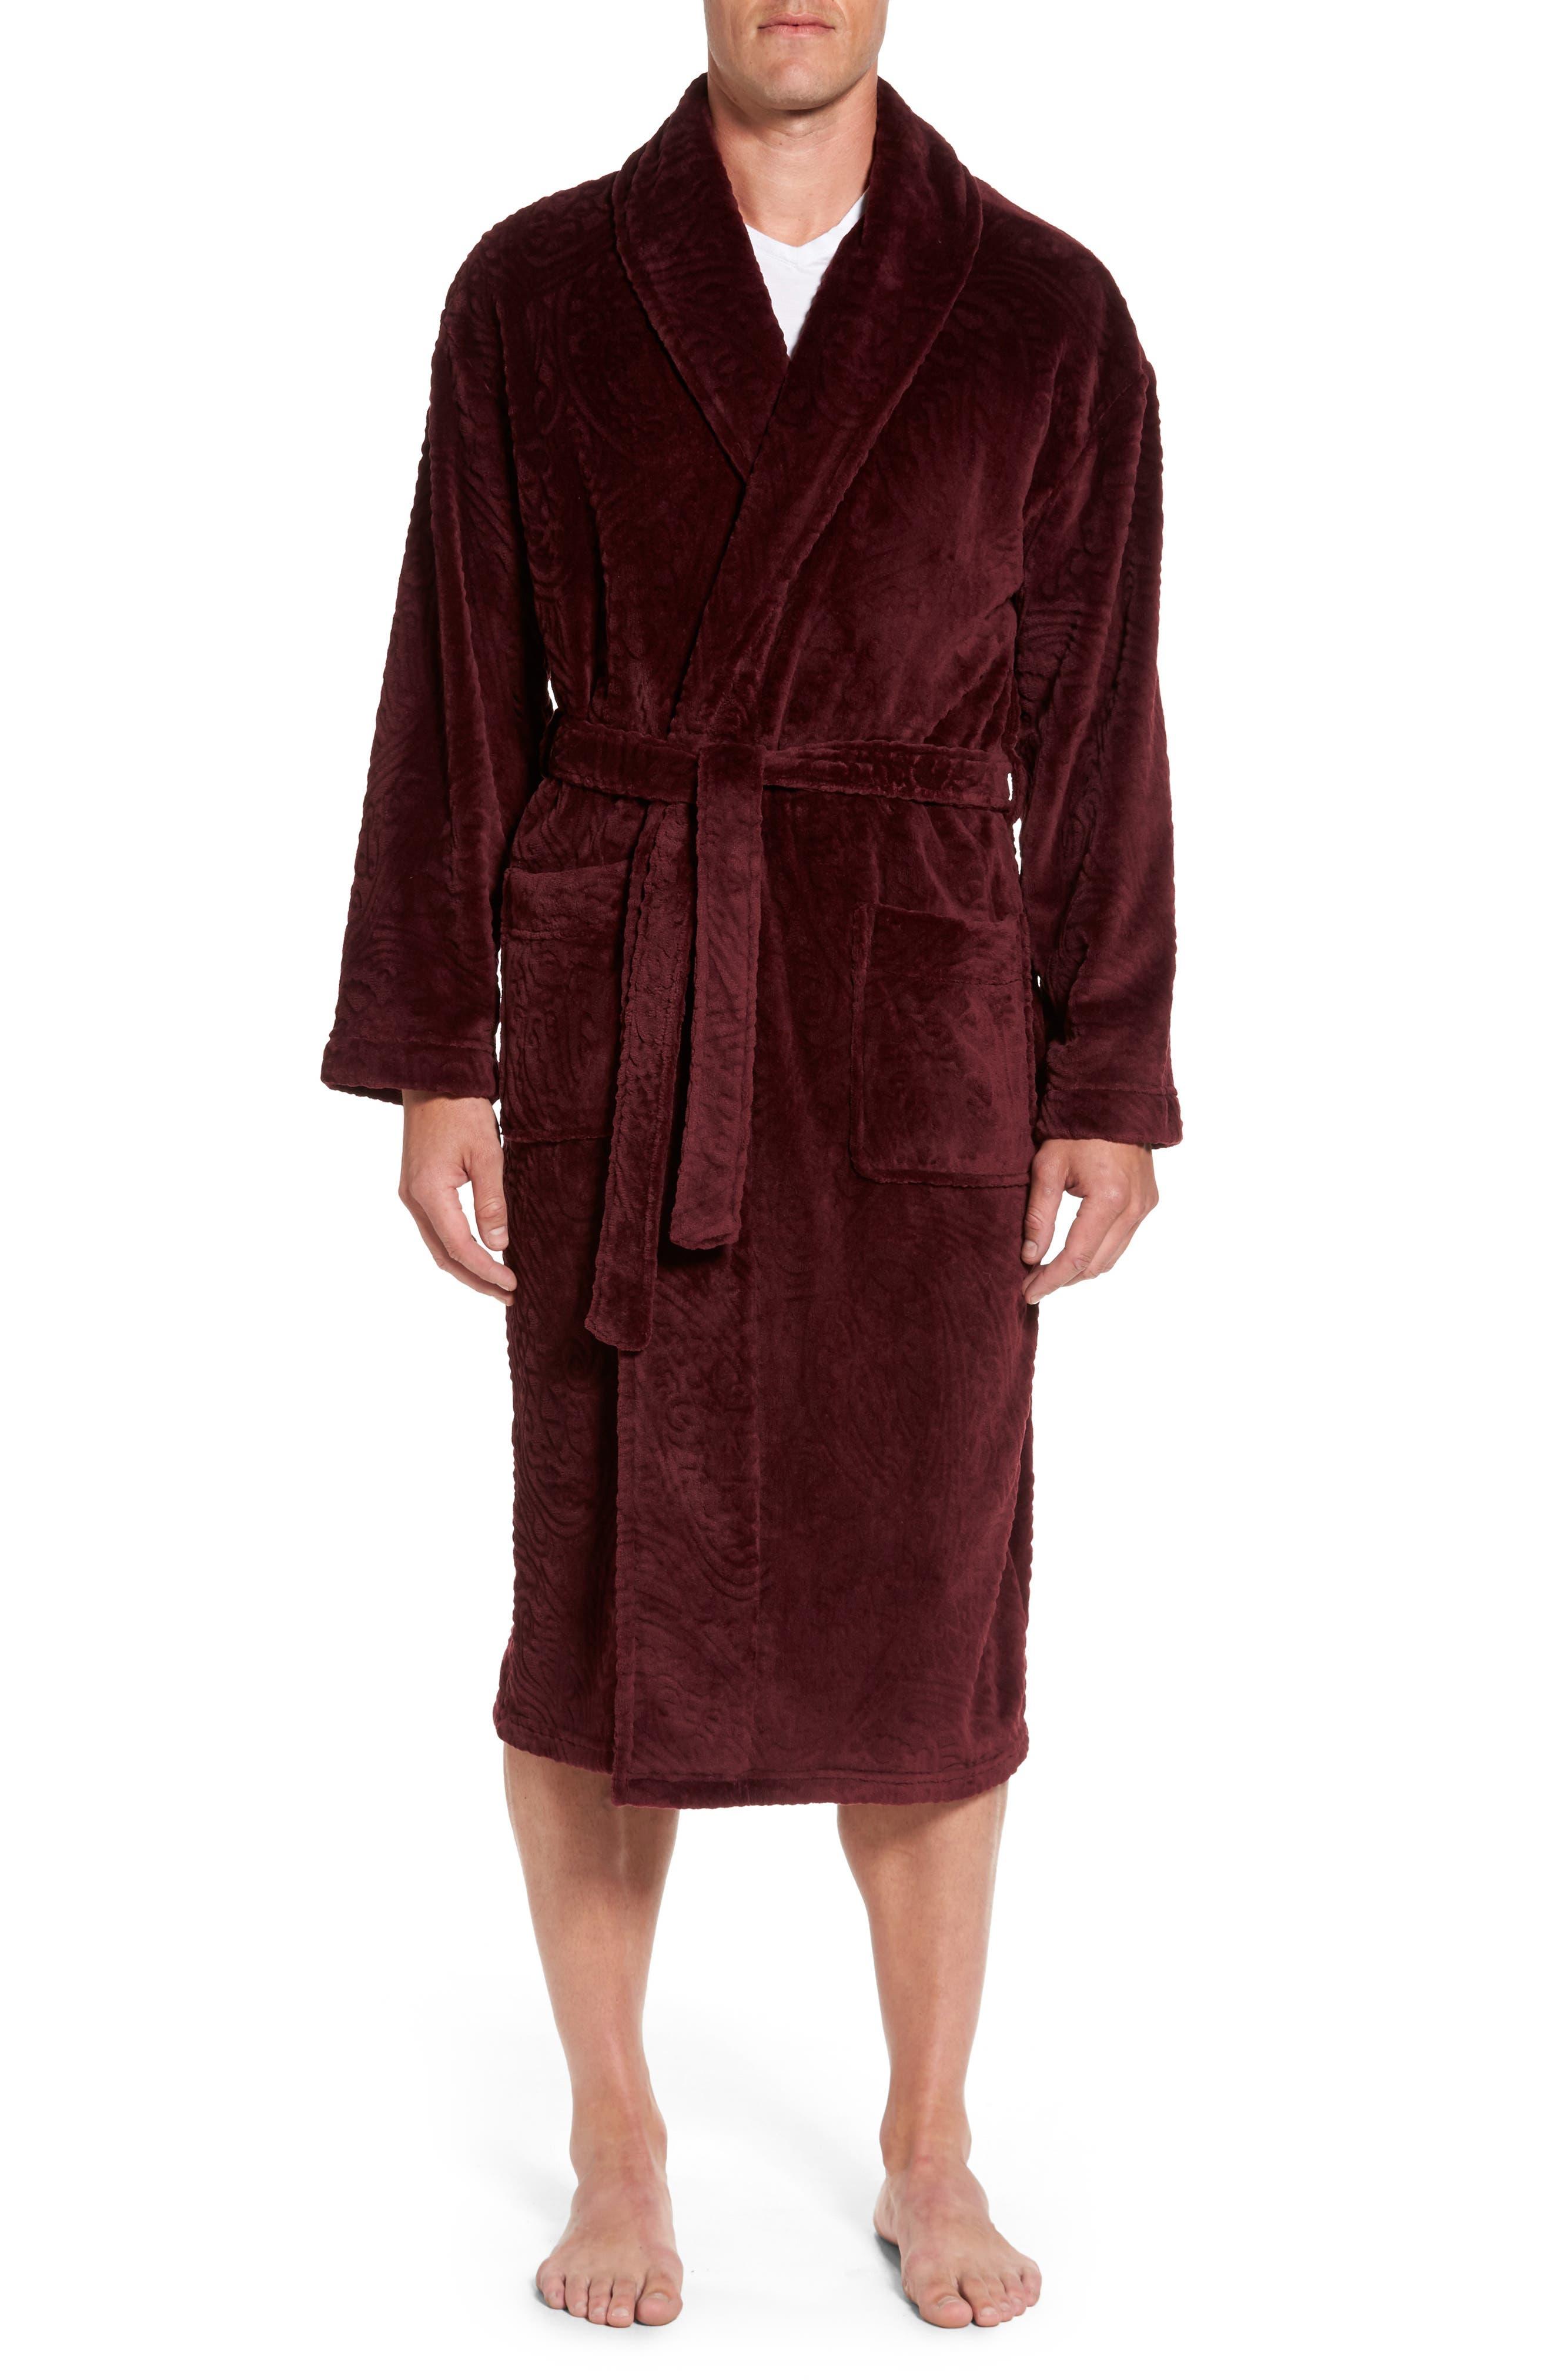 Midtown Robe,                             Main thumbnail 1, color,                             Burgundy Paisley